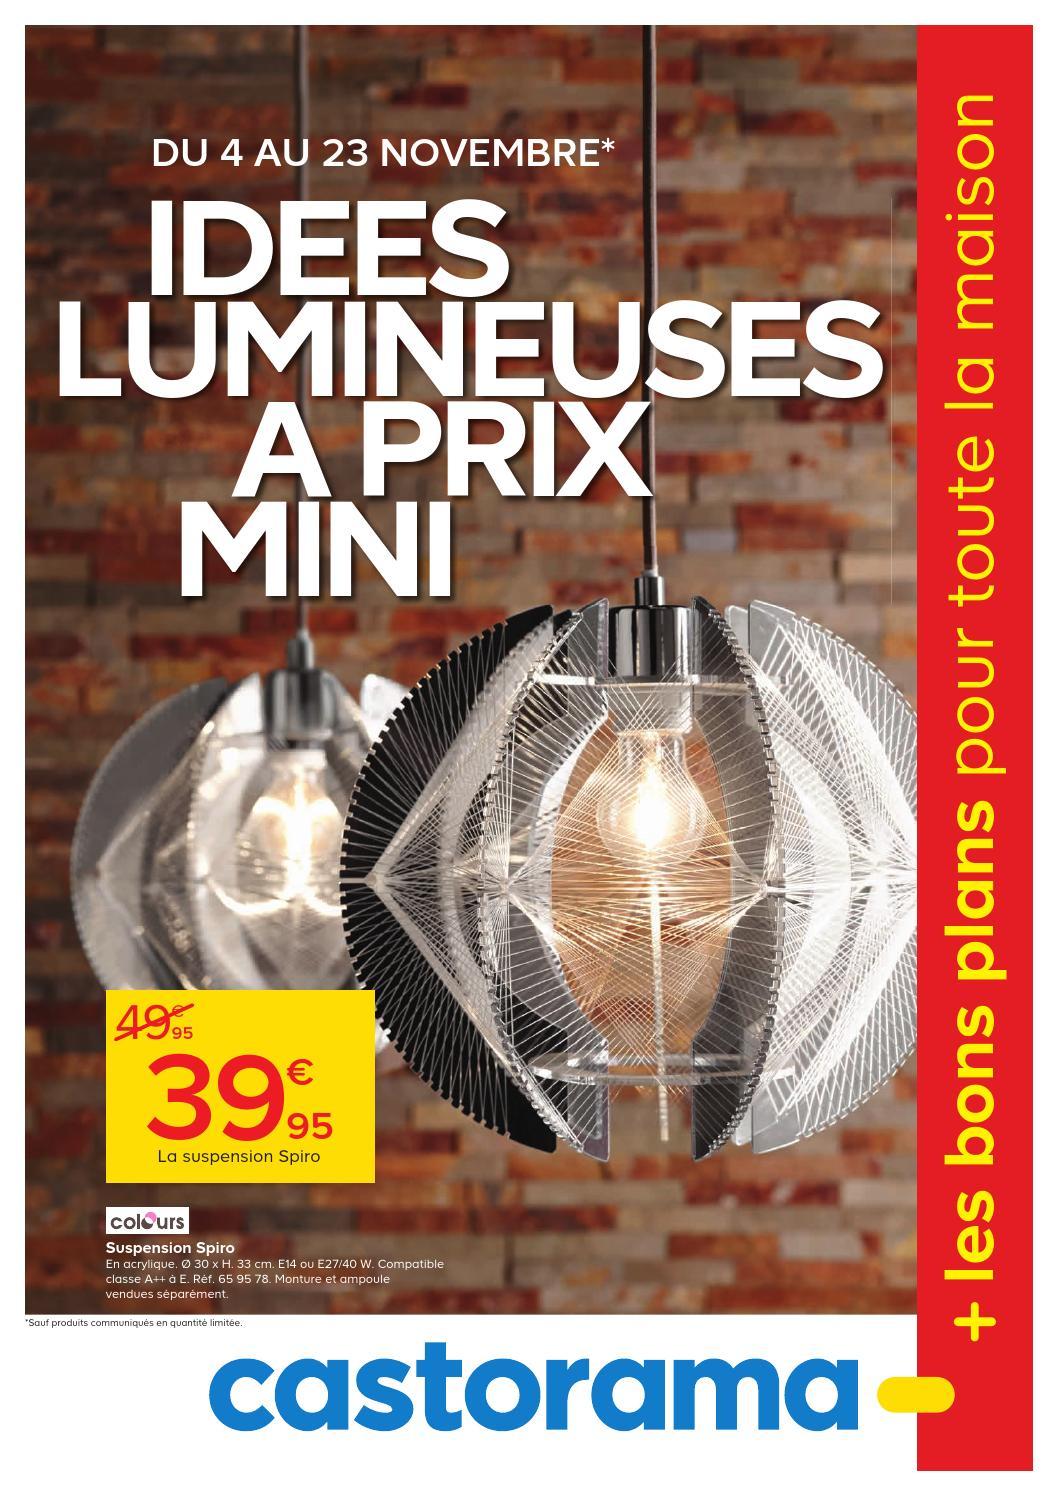 Castorama Catalogue 4 23Novembre2015 By Promocatalogues ... concernant Réhausse Béton 50X50 Castorama